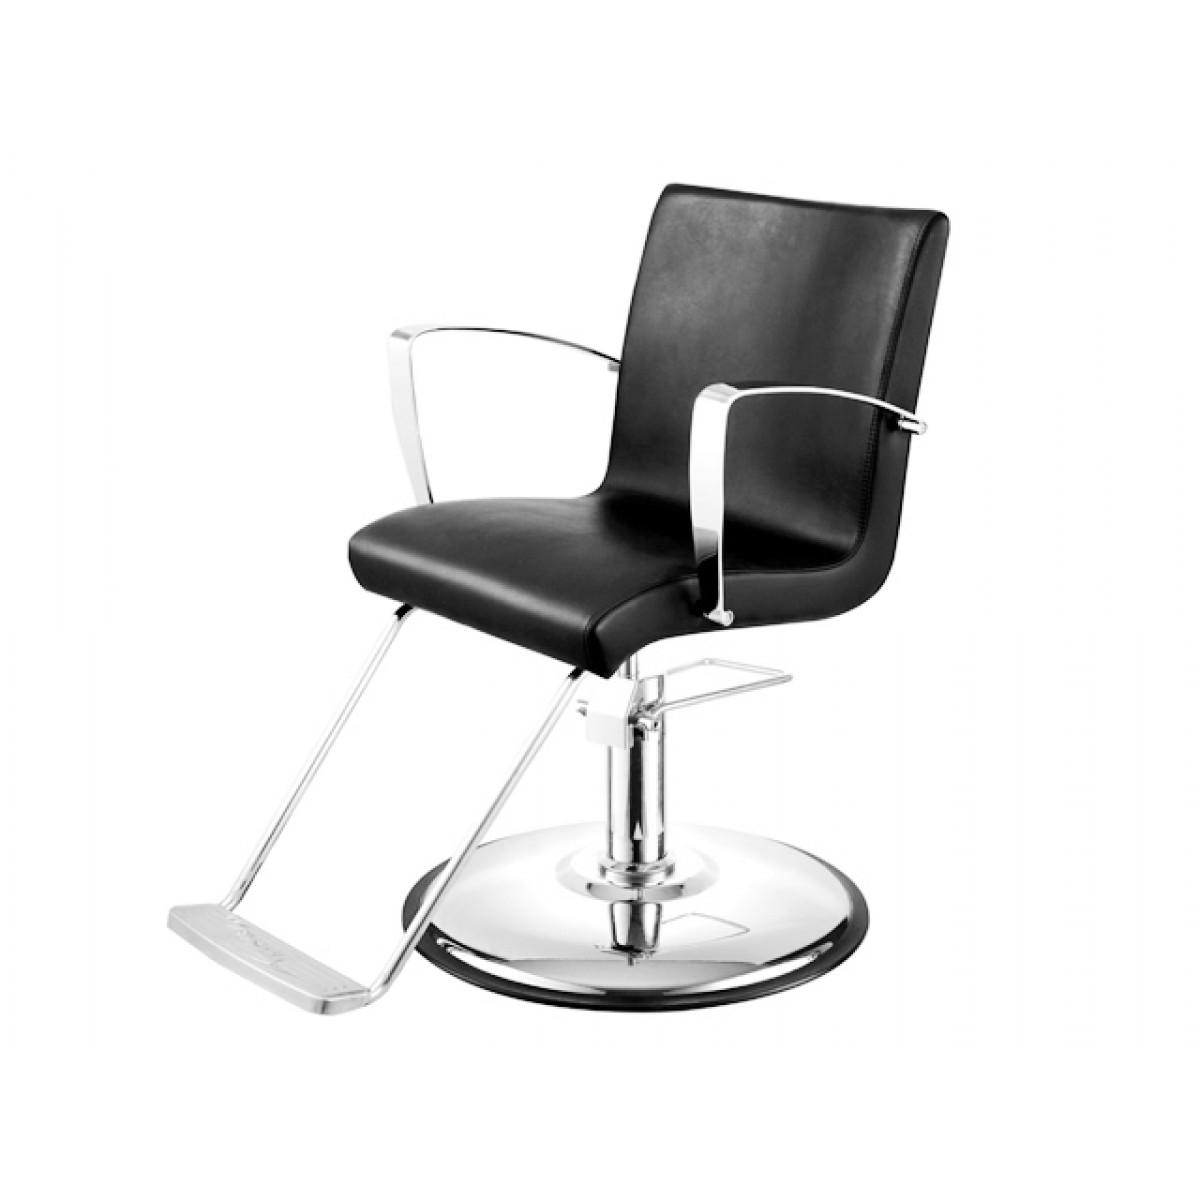 """SALLY"" Salon Styling Chair"